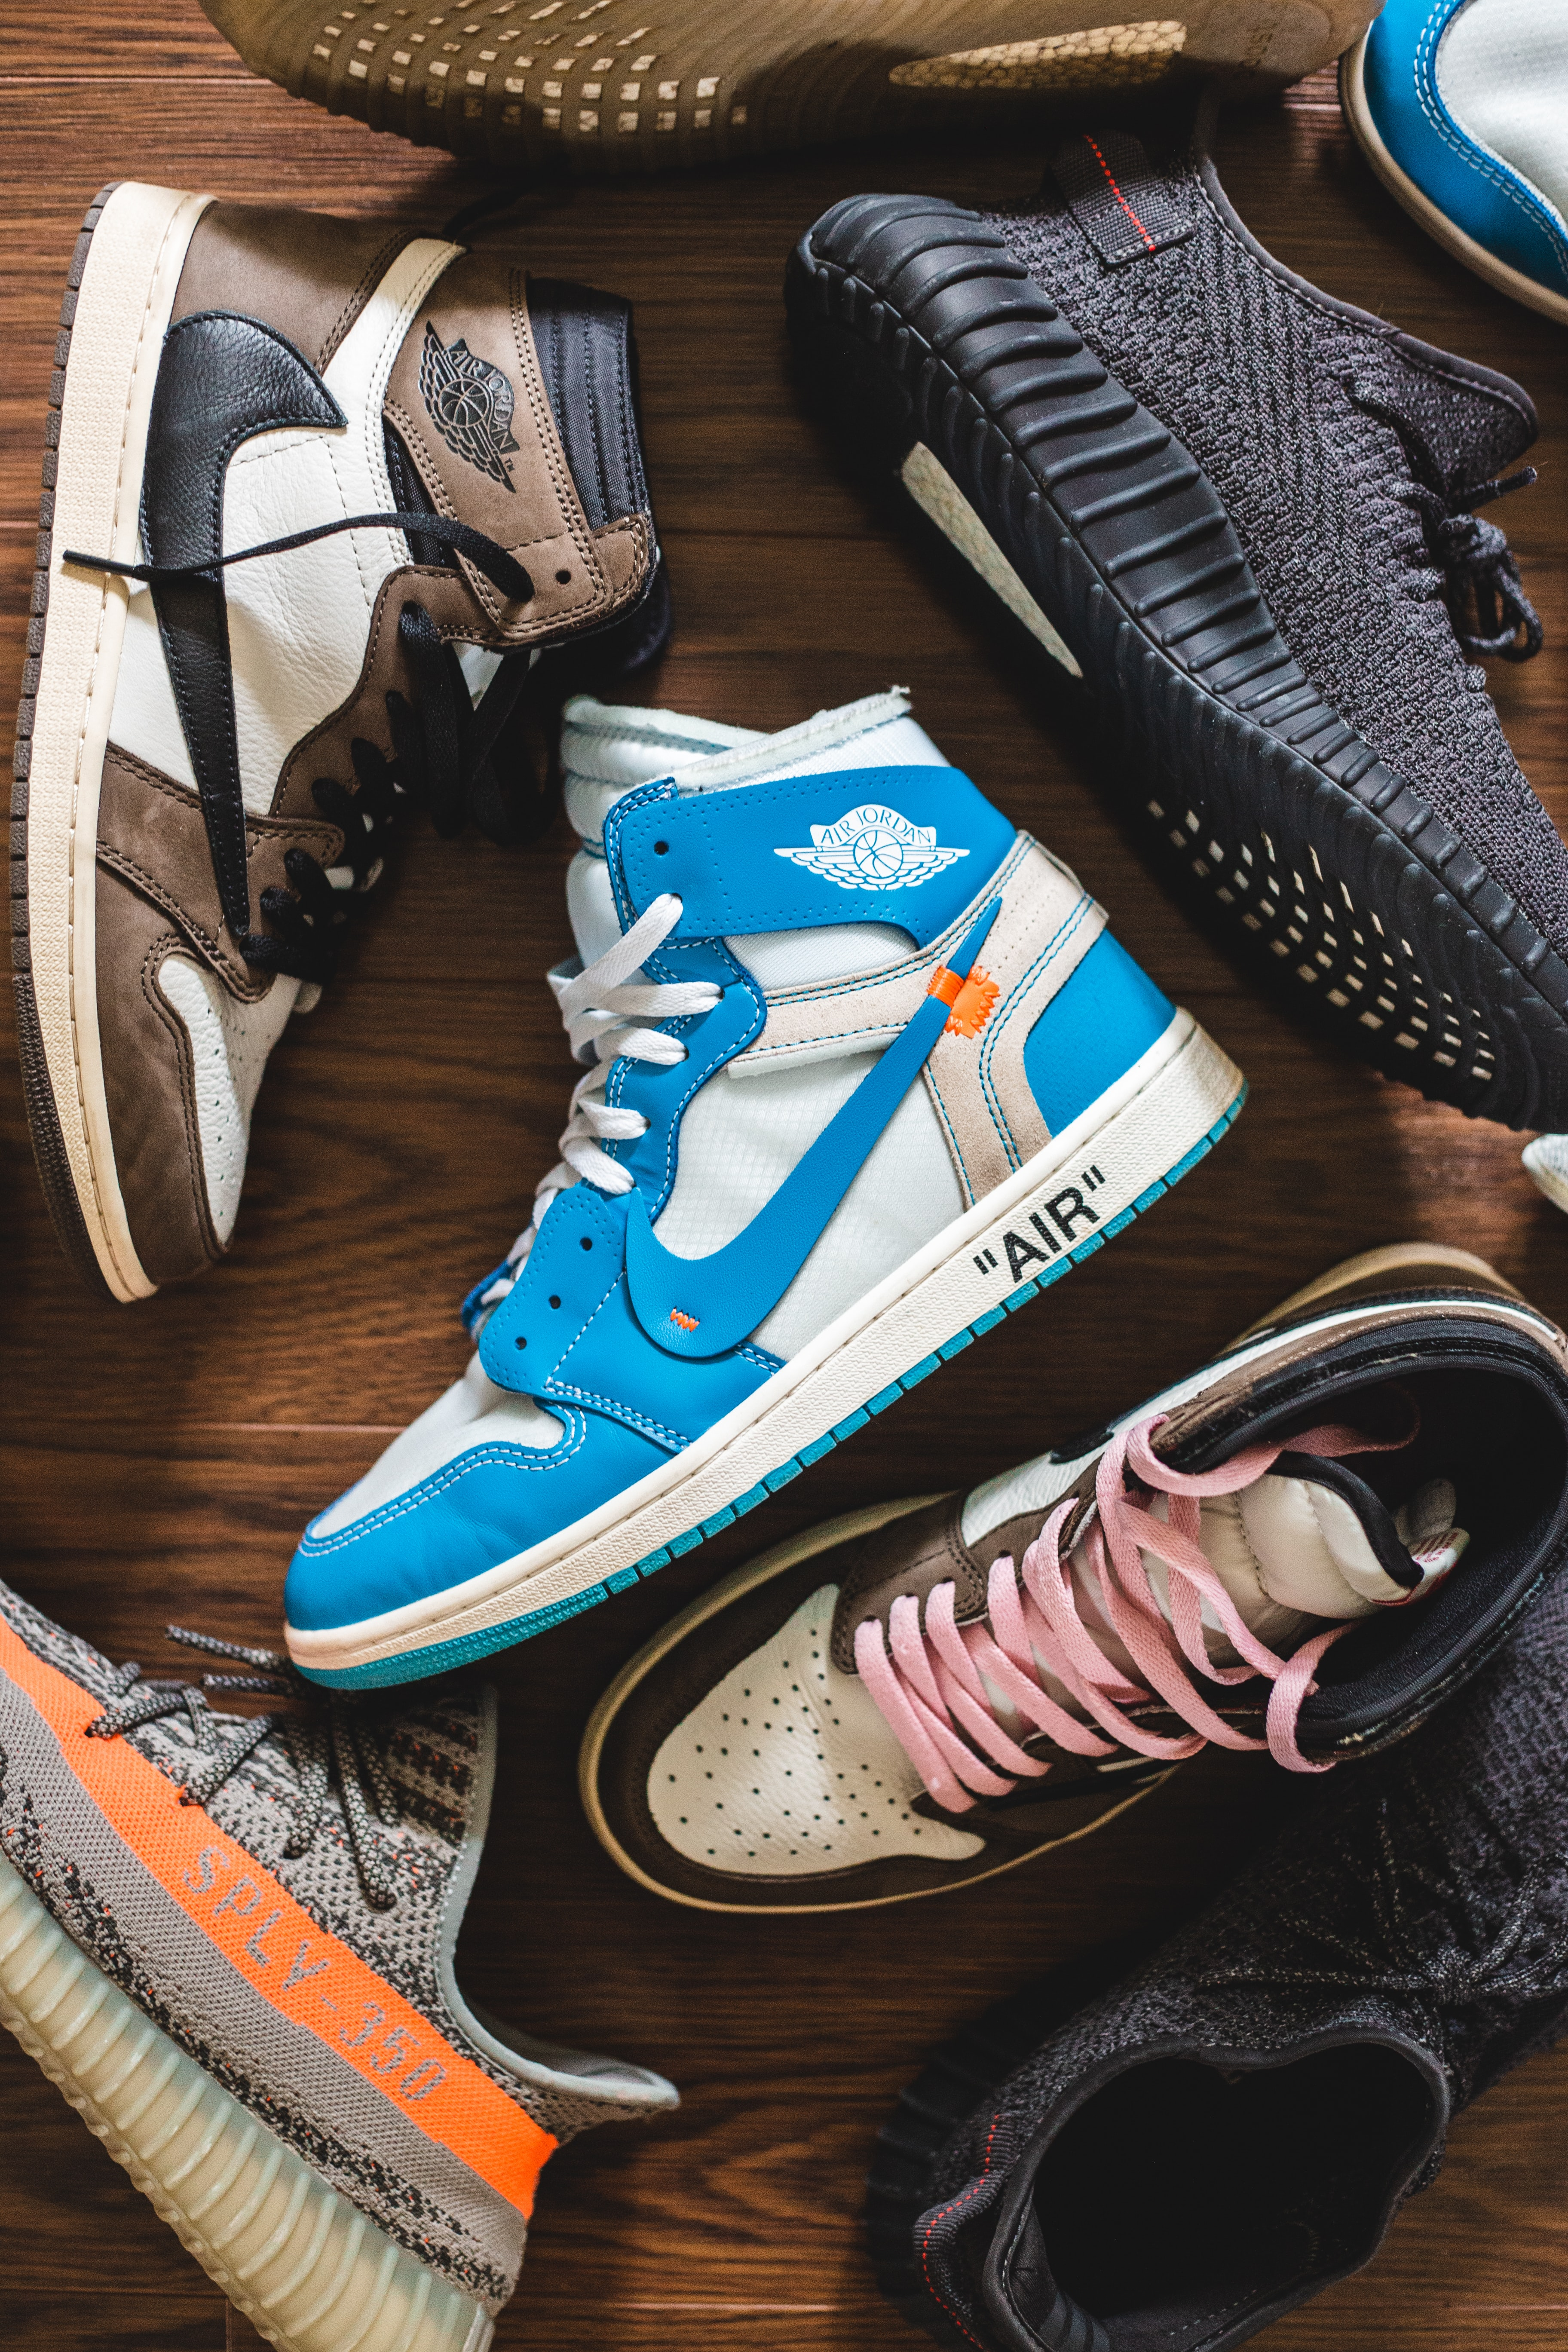 Nike SB Dunk Low 'Freddy Krueger'